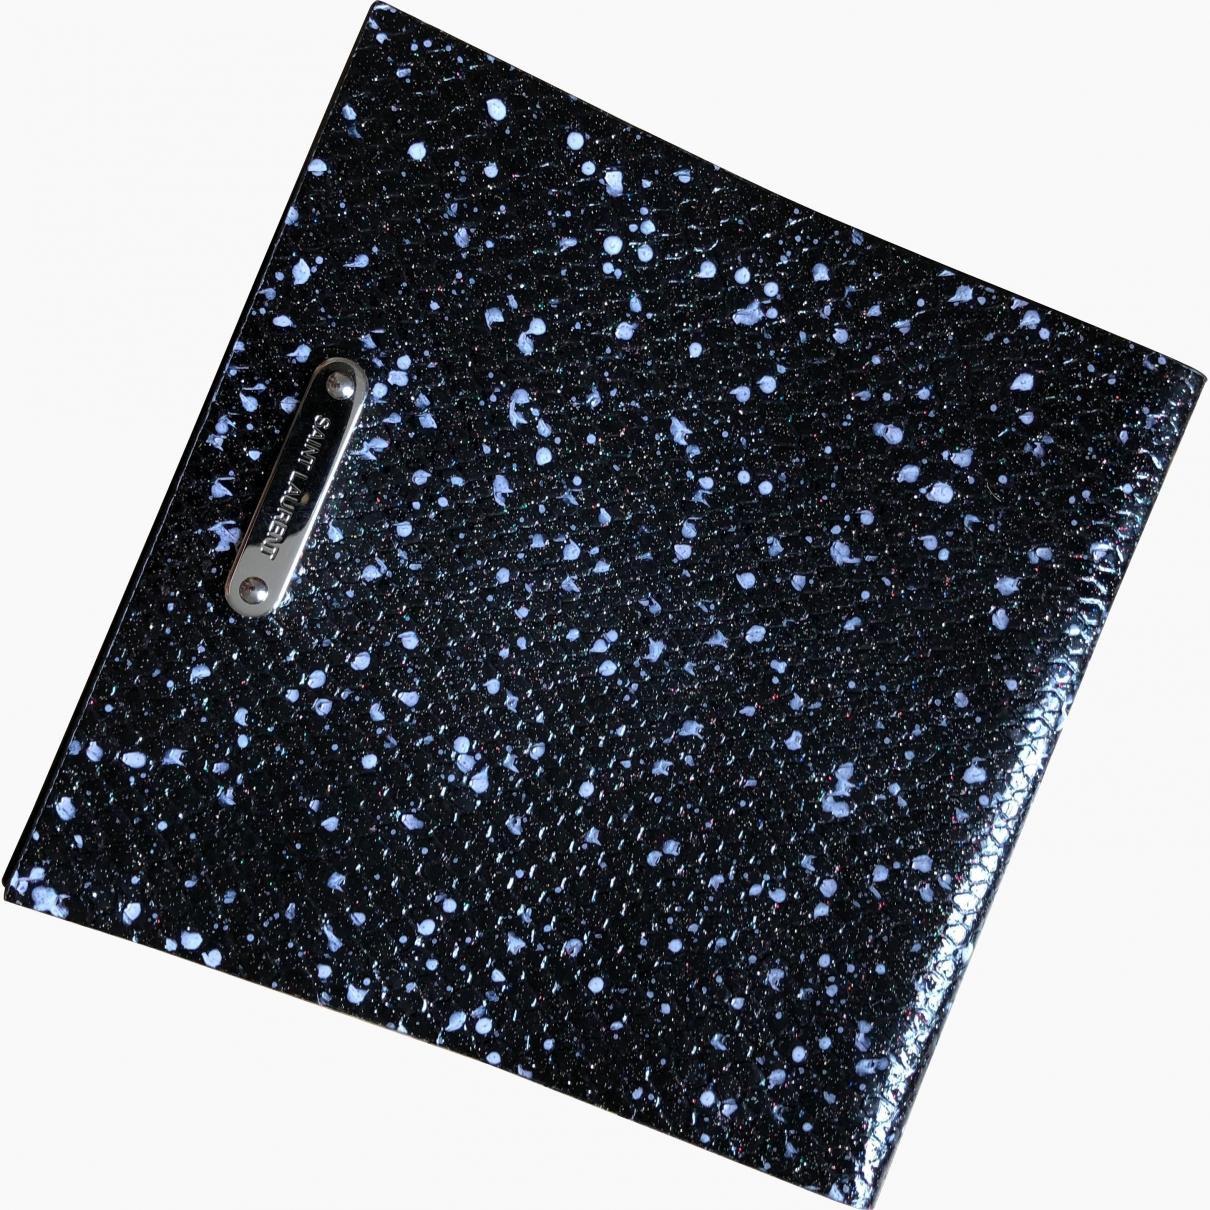 Saint Laurent \N Black Glitter Clutch bag for Women \N